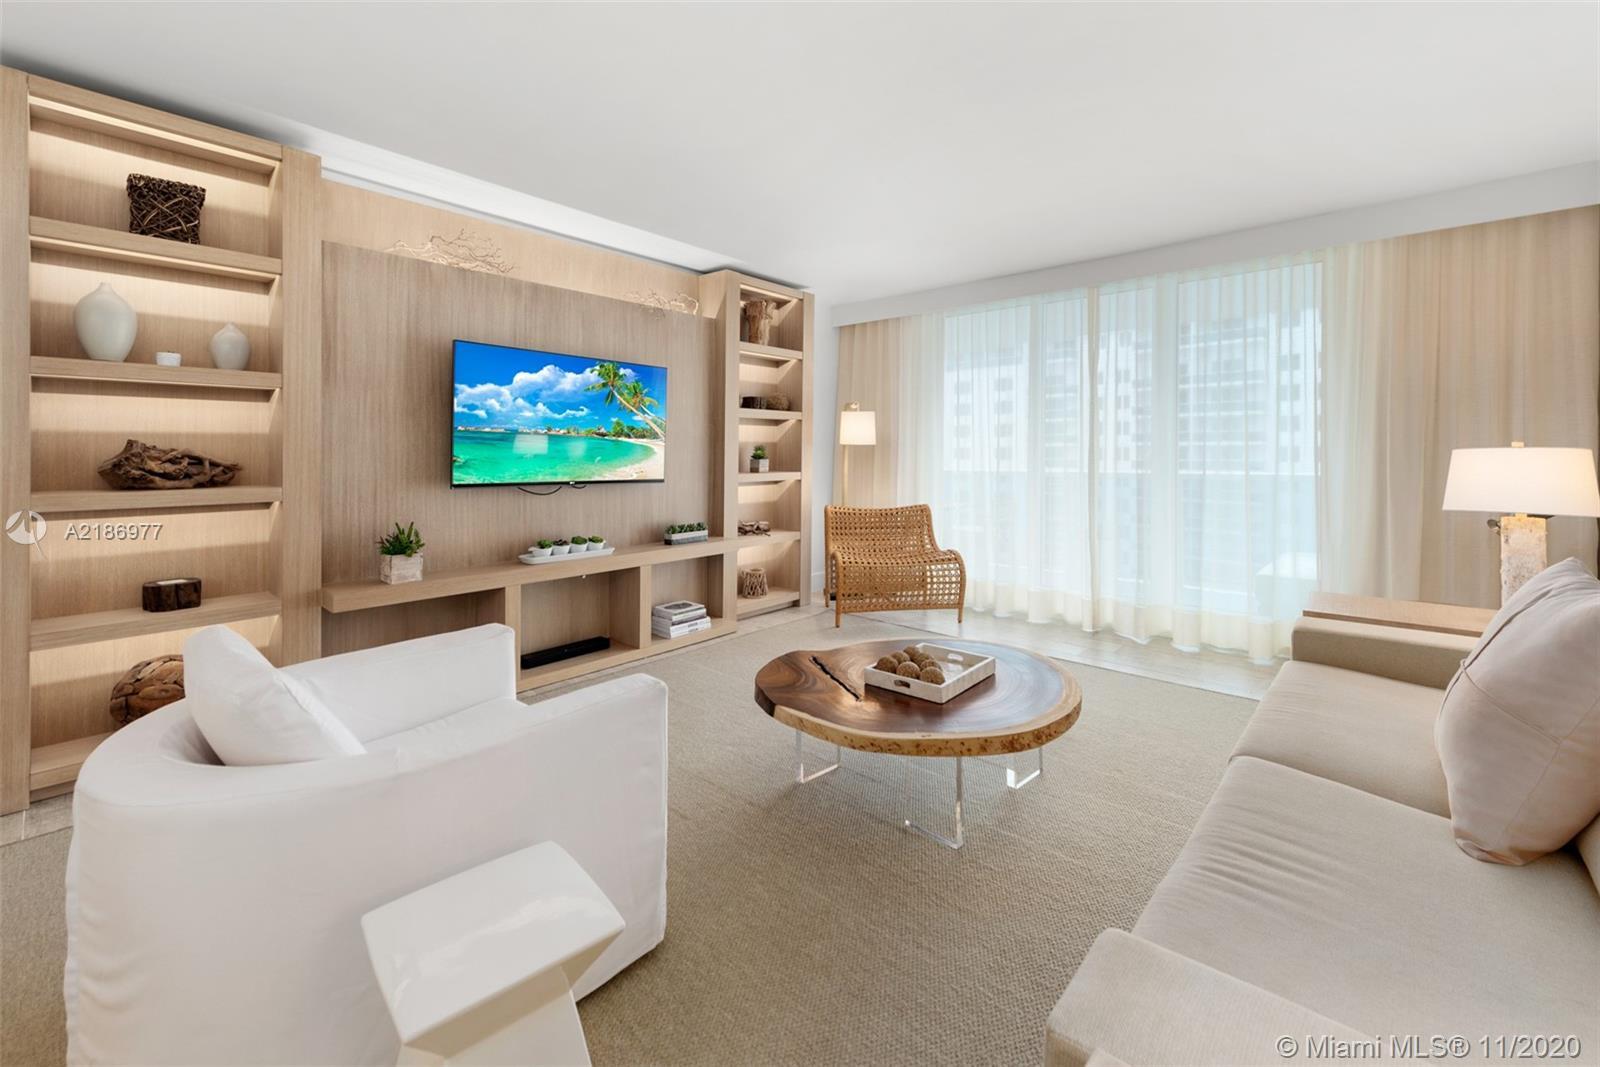 1 Hotel & Homes #1408 - 102 24 ST #1408, Miami Beach, FL 33139